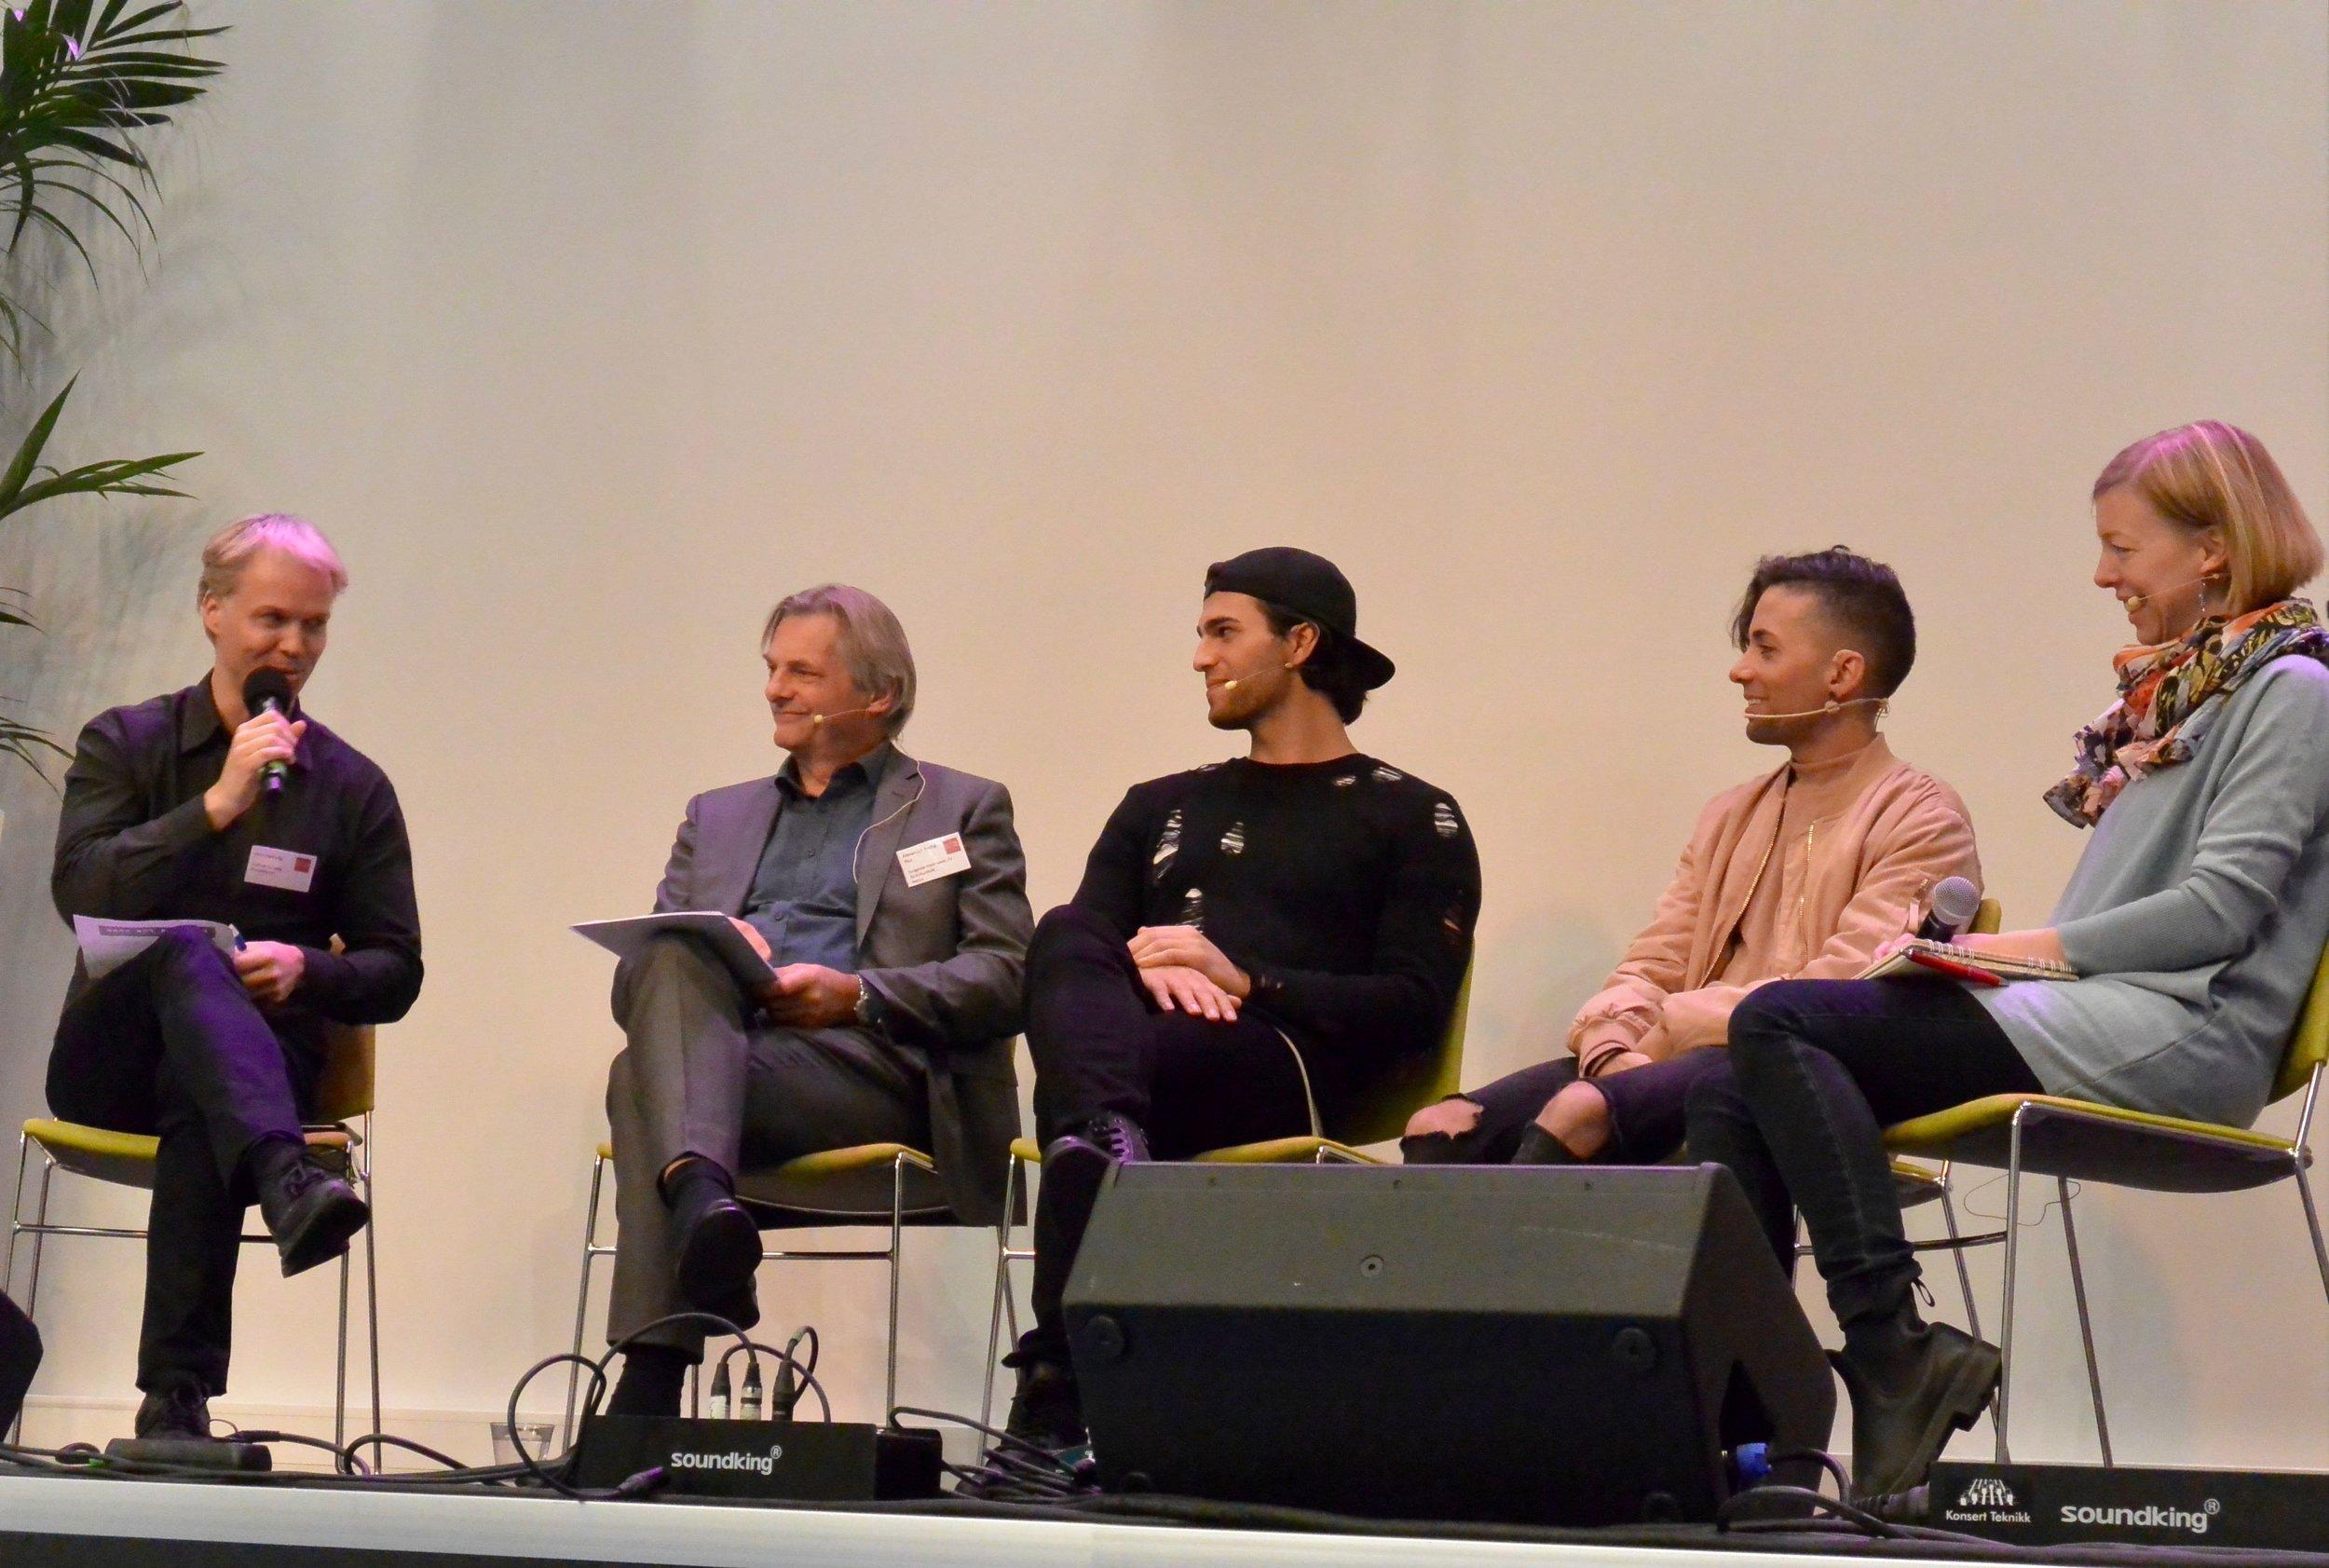 Jarle Flemvåg, Alexander Krohg Plur, Tooji, Omer Bhatti og Victoria Liedbergius